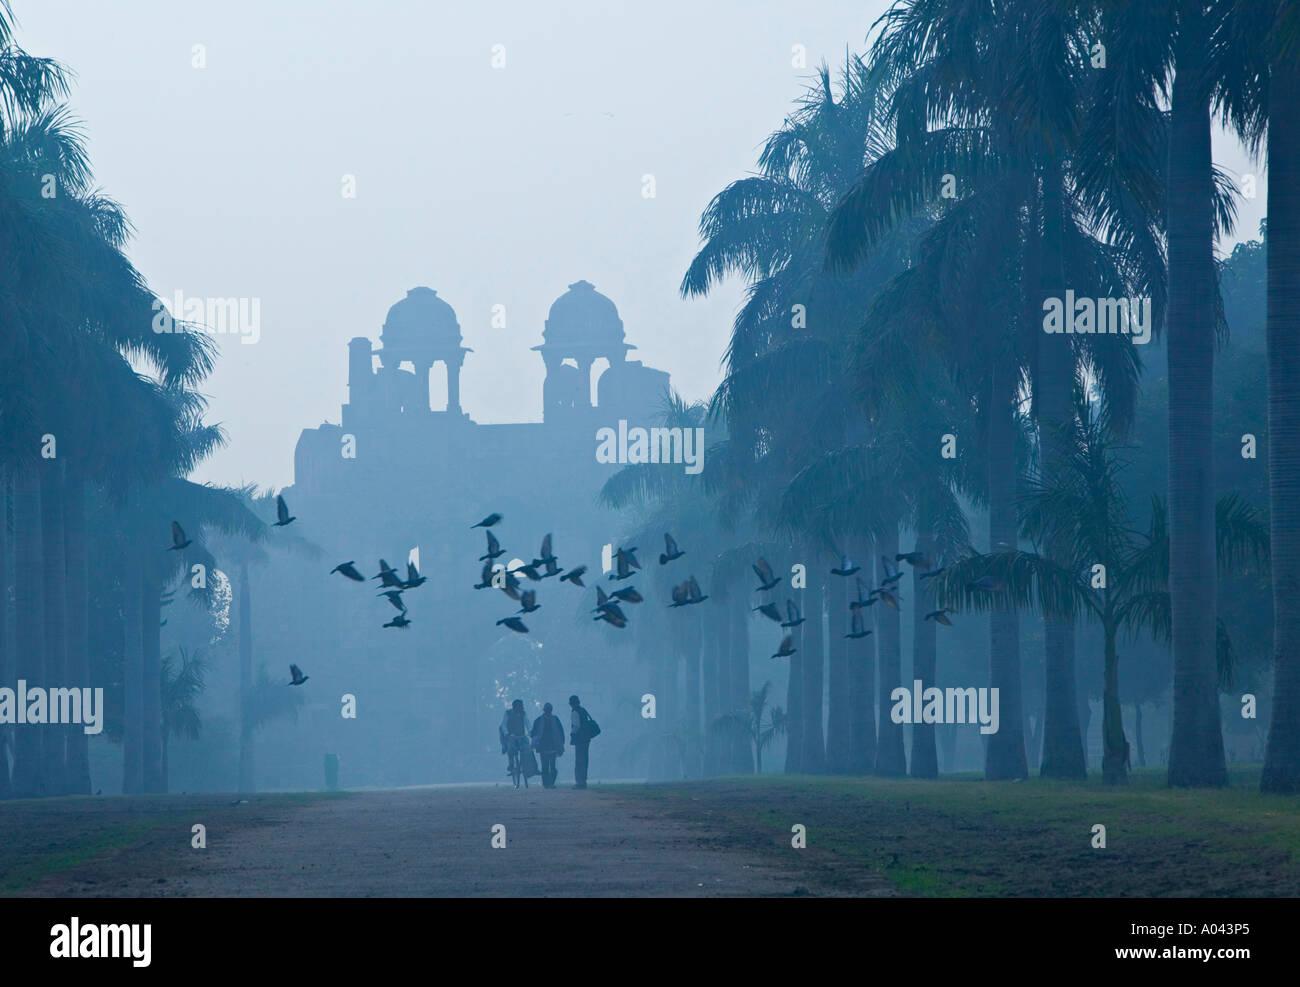 Purana Qila (Vieux Fort construit par Sher Shar 1545), Delhi, Inde Photo Stock